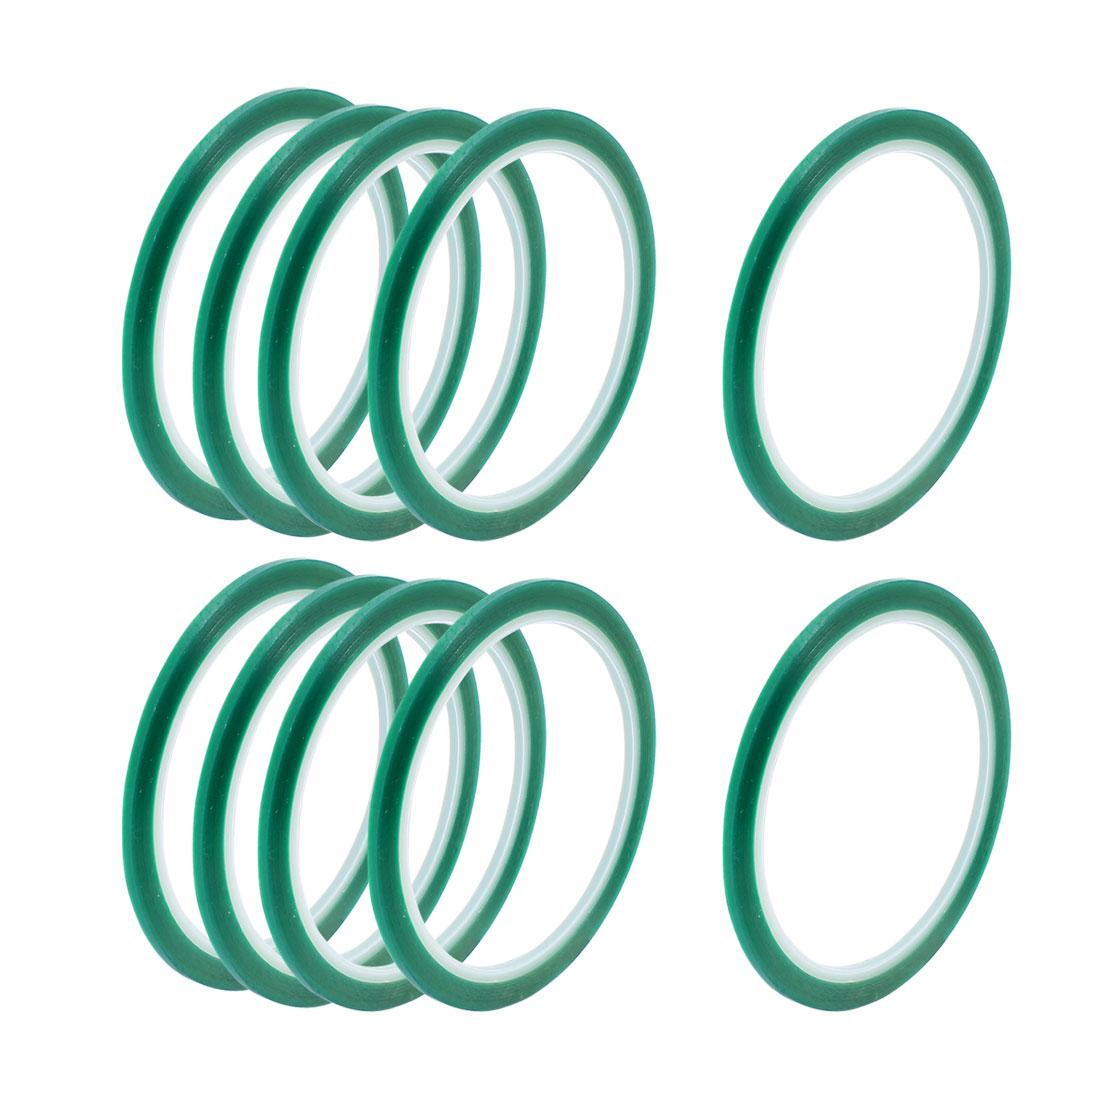 10pcs 3mm Width 33M Long Green PET High Temperature Heat Resistant PCB Solder Tape